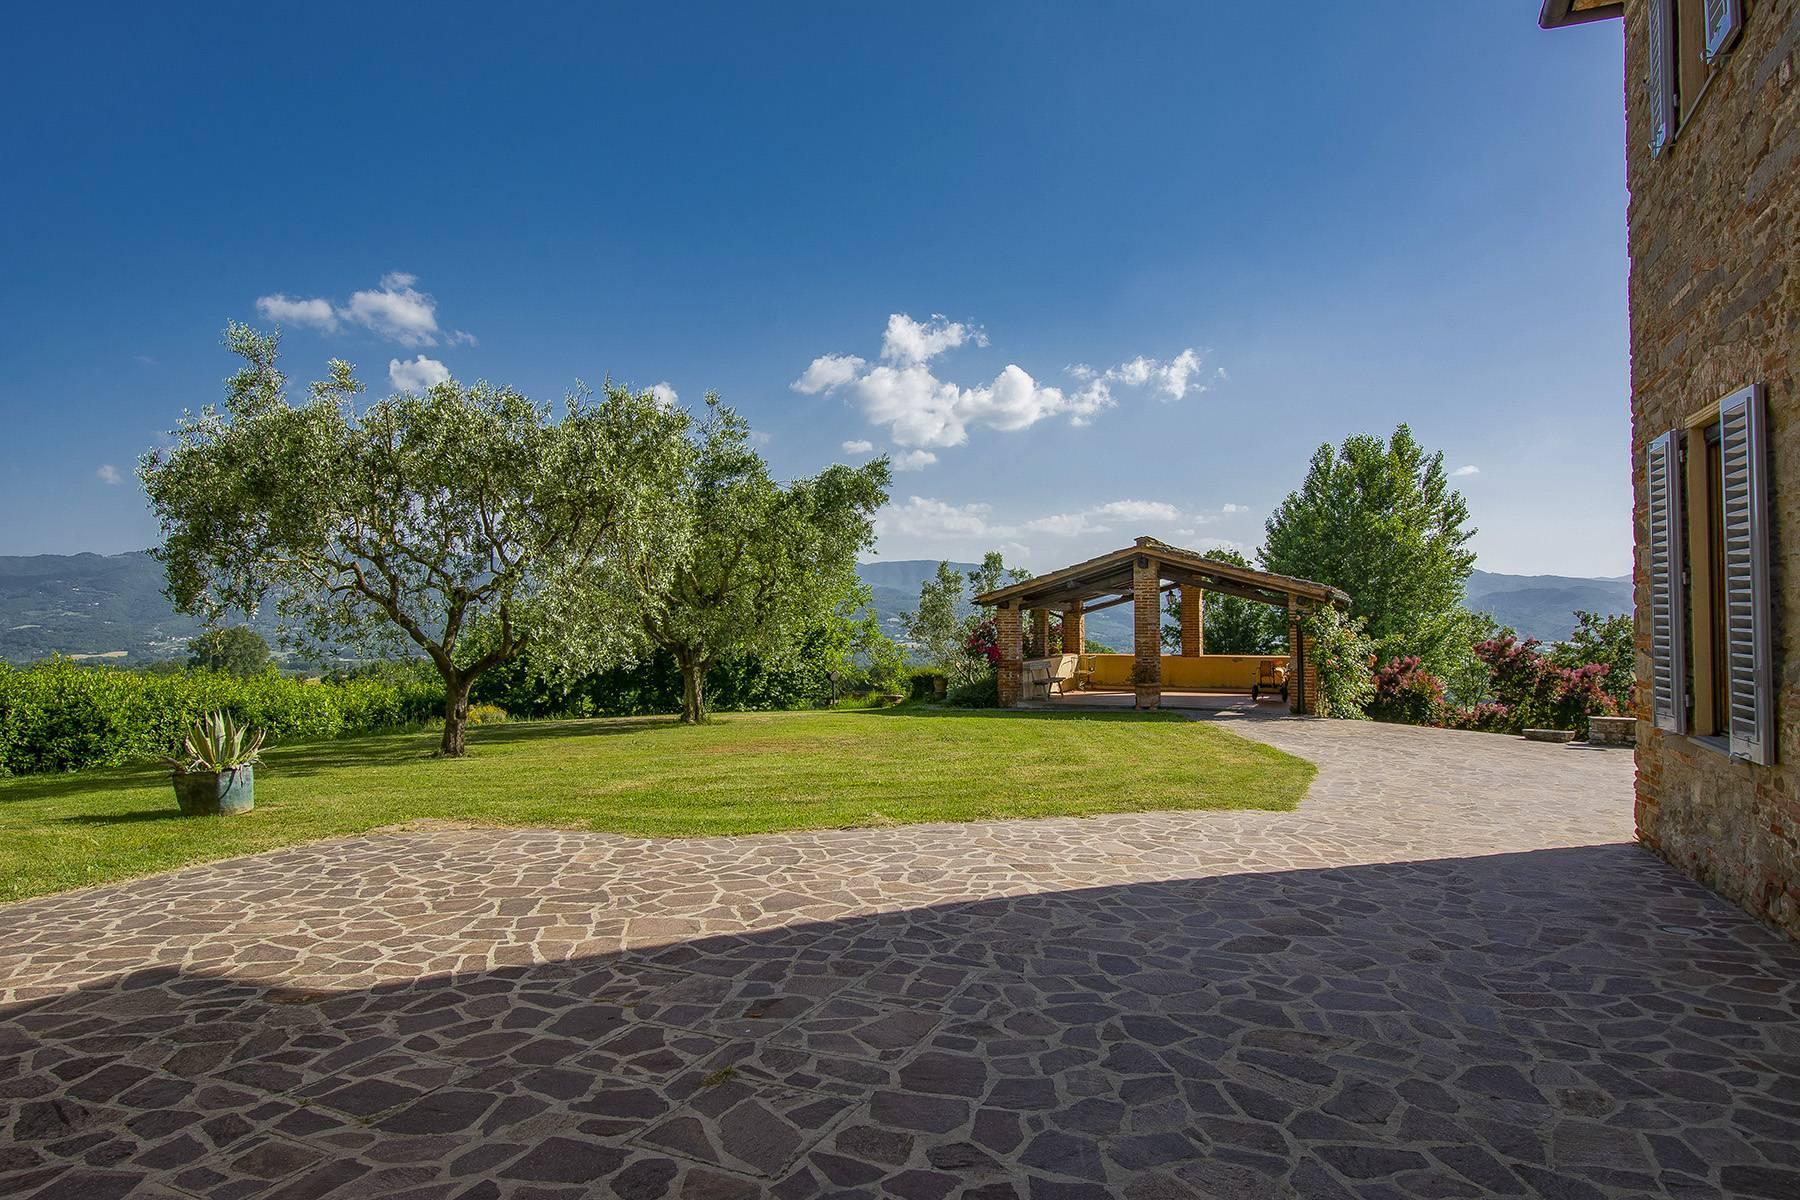 Farmhouse nestled on the Tuscan hills - 20